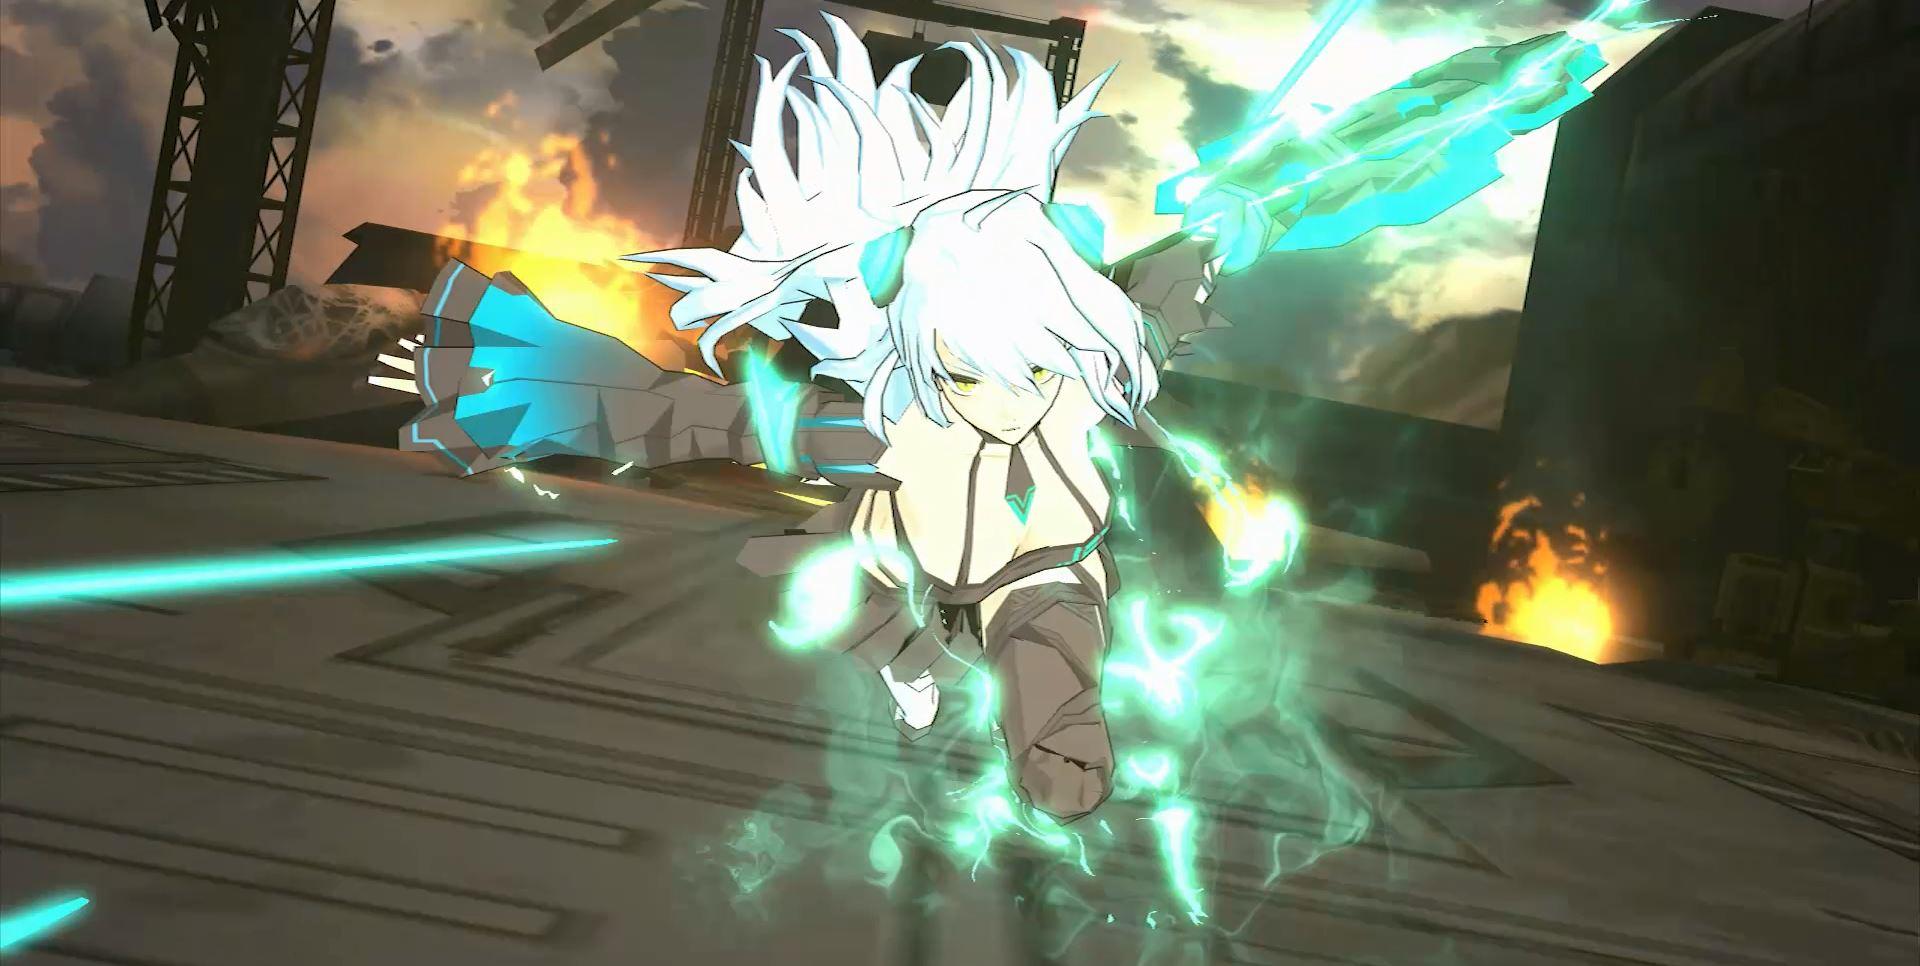 Best Anime Wallpaper Engine Soul Worker Onrpg